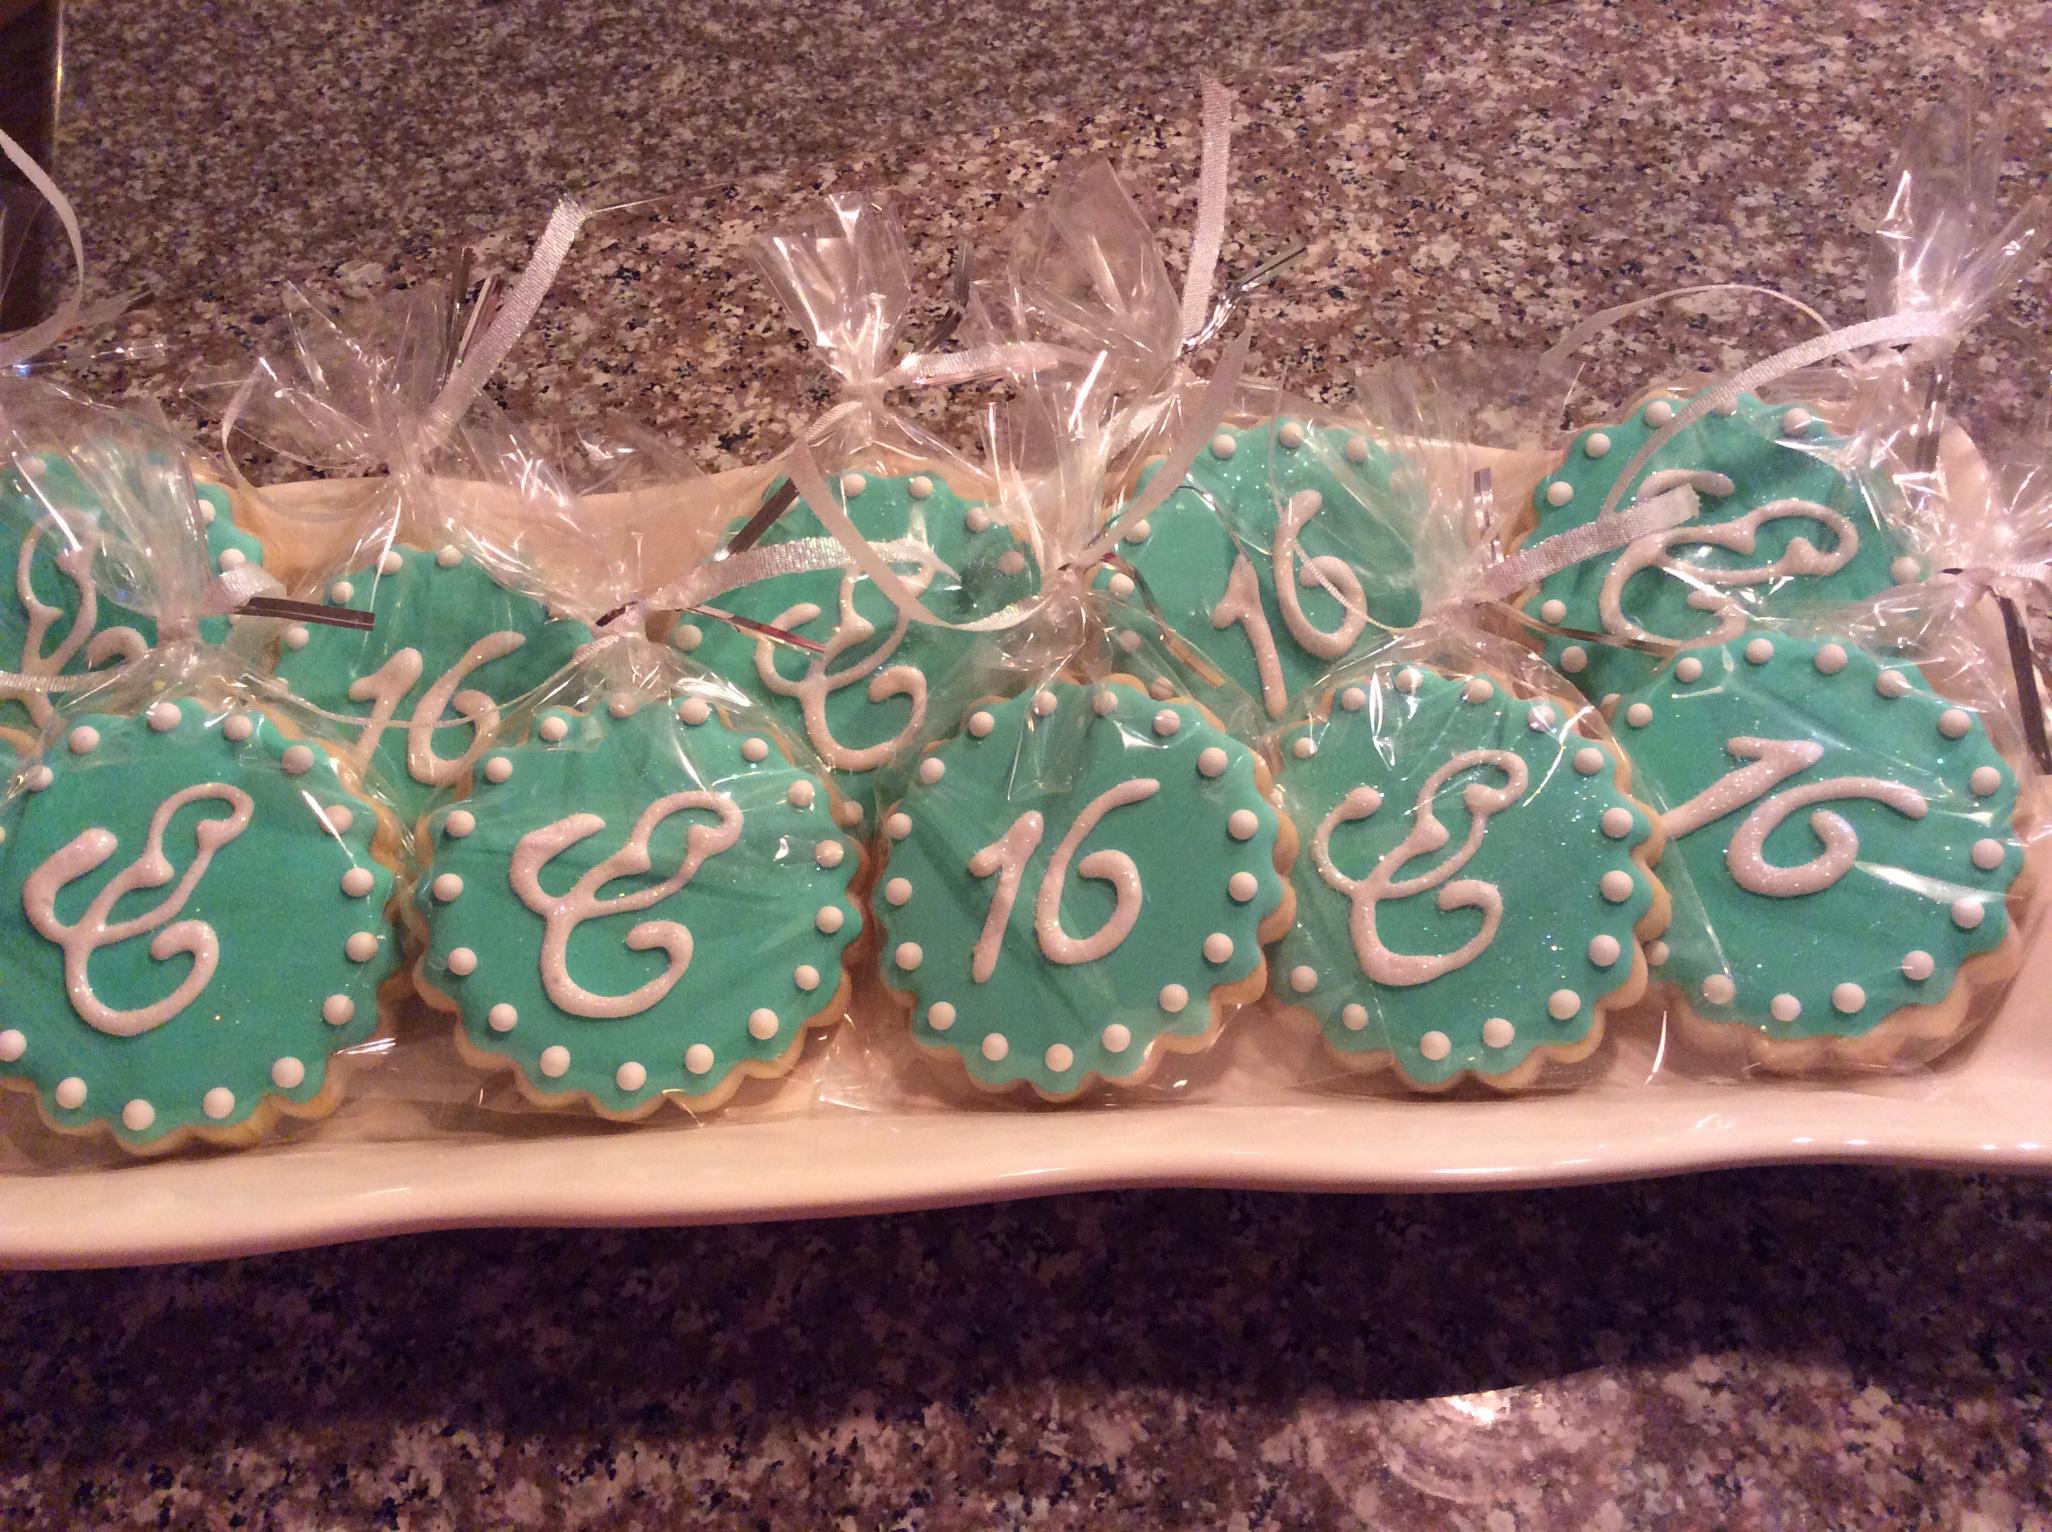 Sweet 16 at Tiffany's Cookies